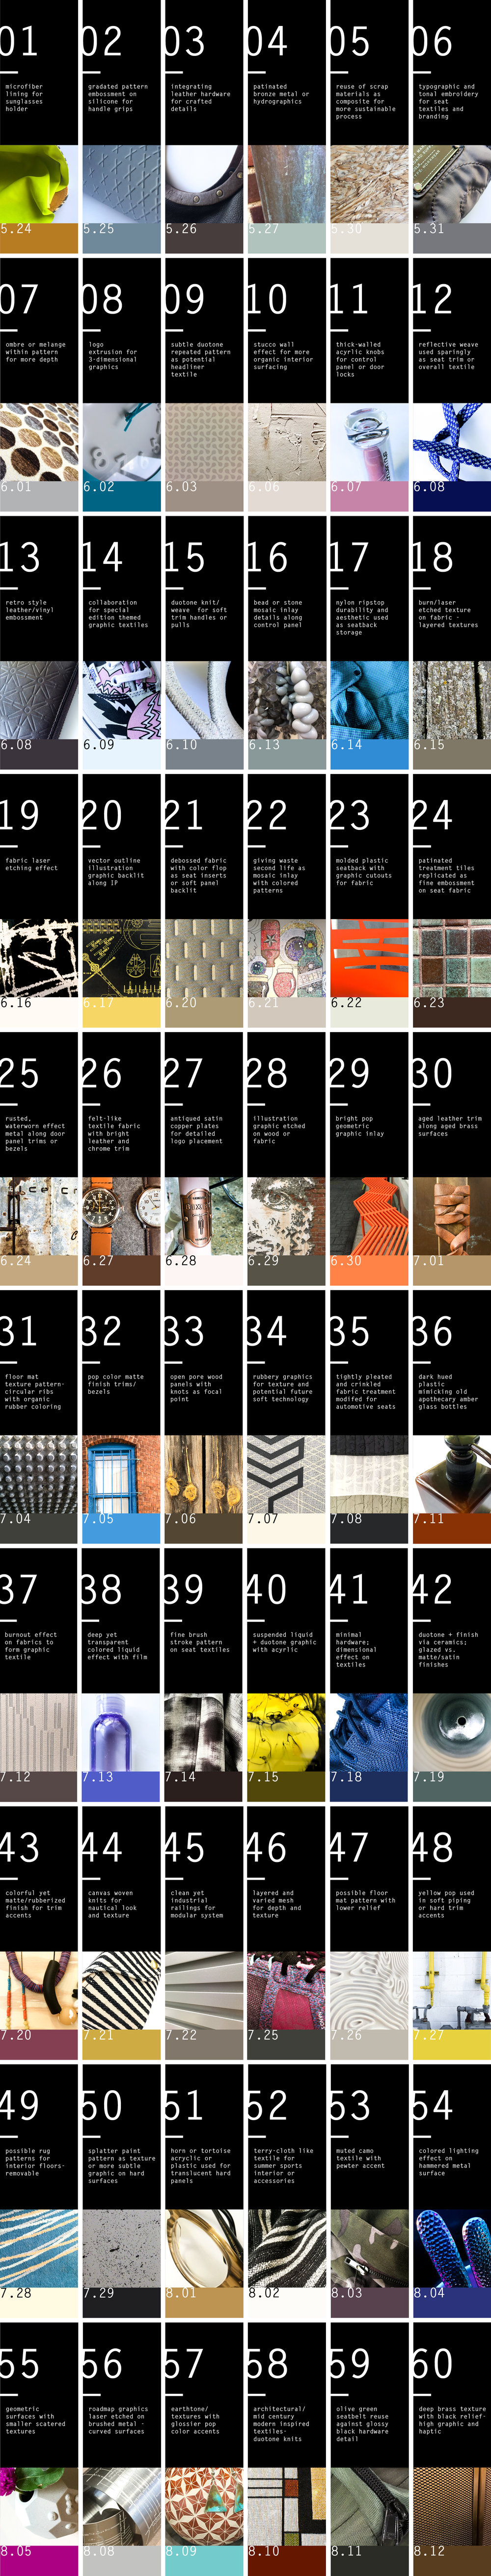 60-Day-Project-narrow.jpg